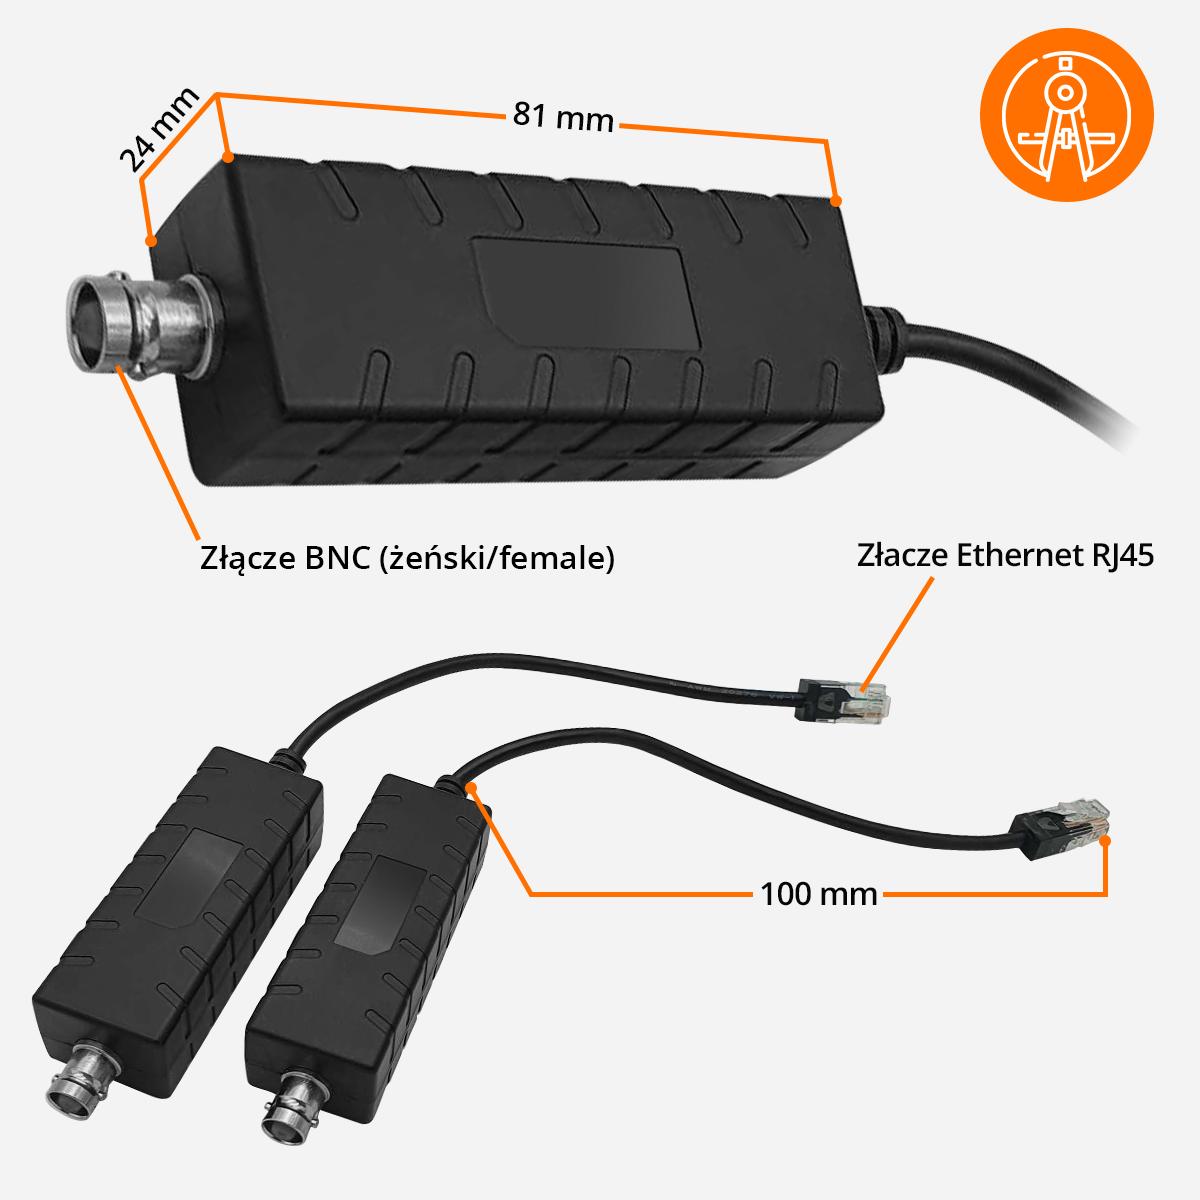 extender-eoc-specyfikacja-orllo-pl